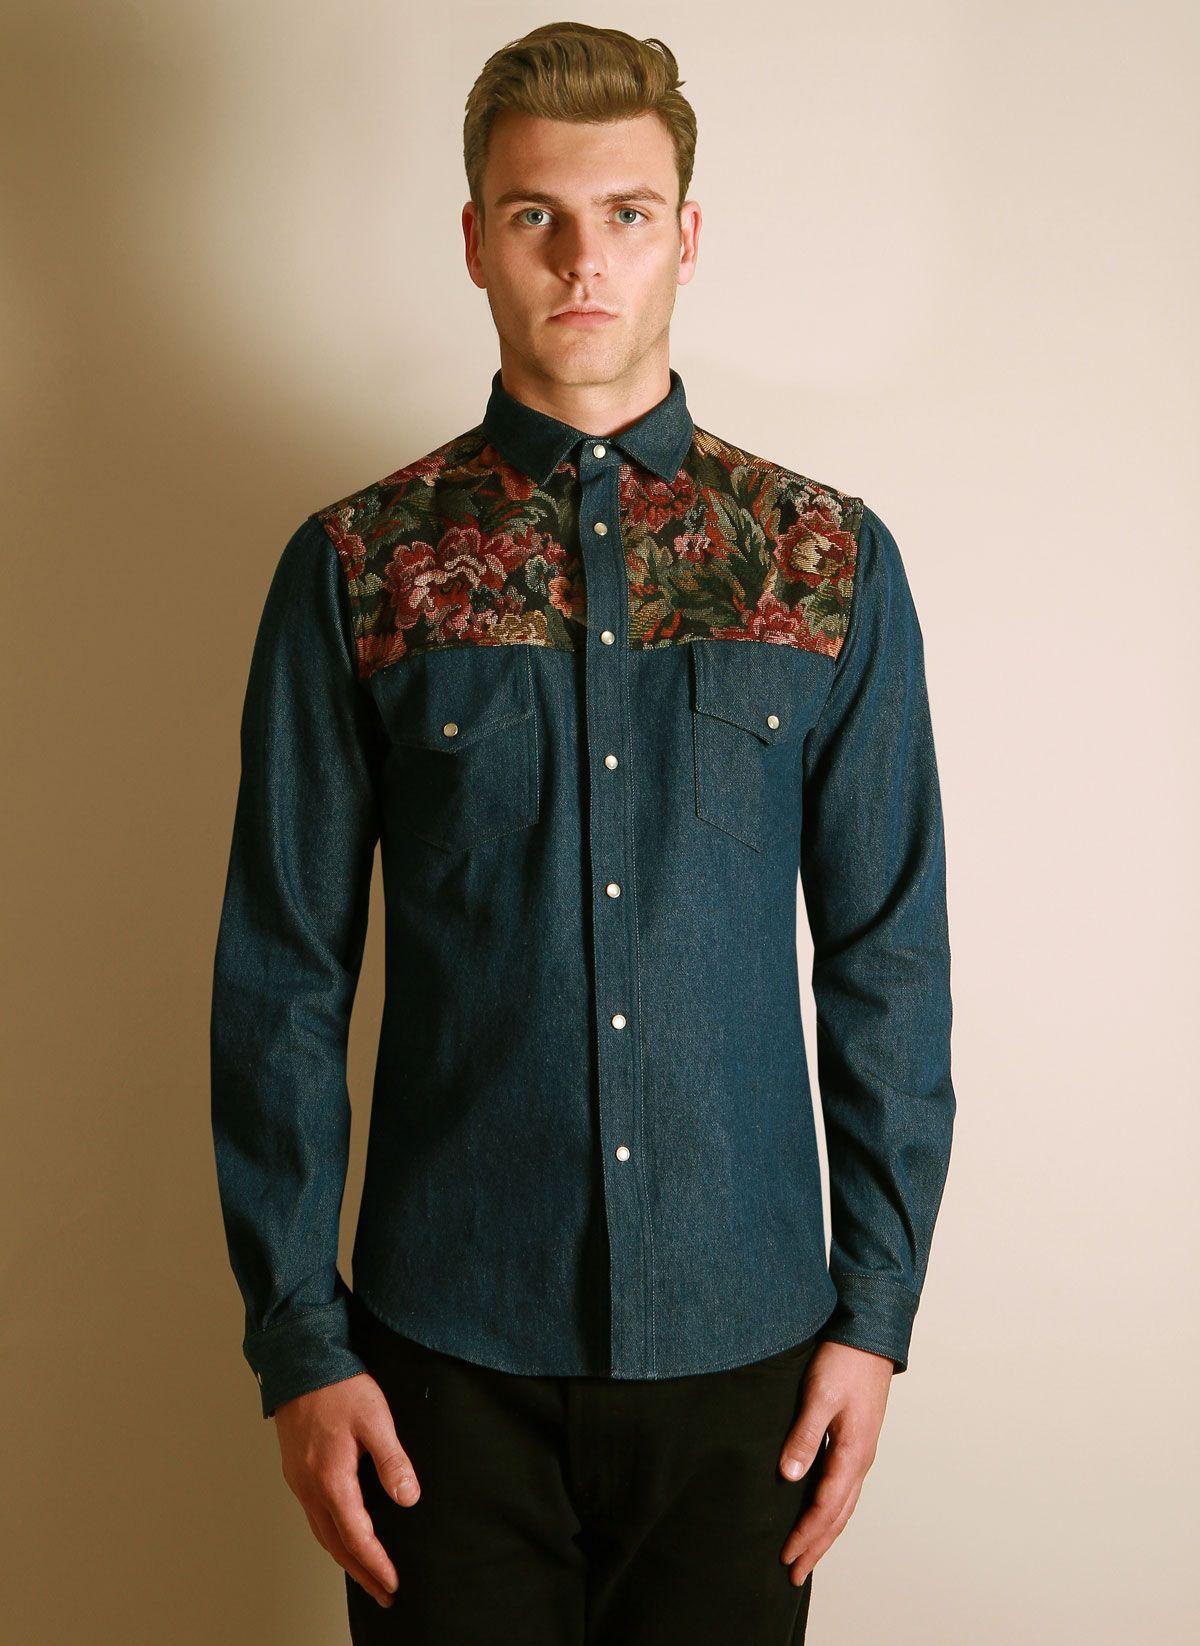 221cca5d9303 To-orist - Denim Tapestry Shirt